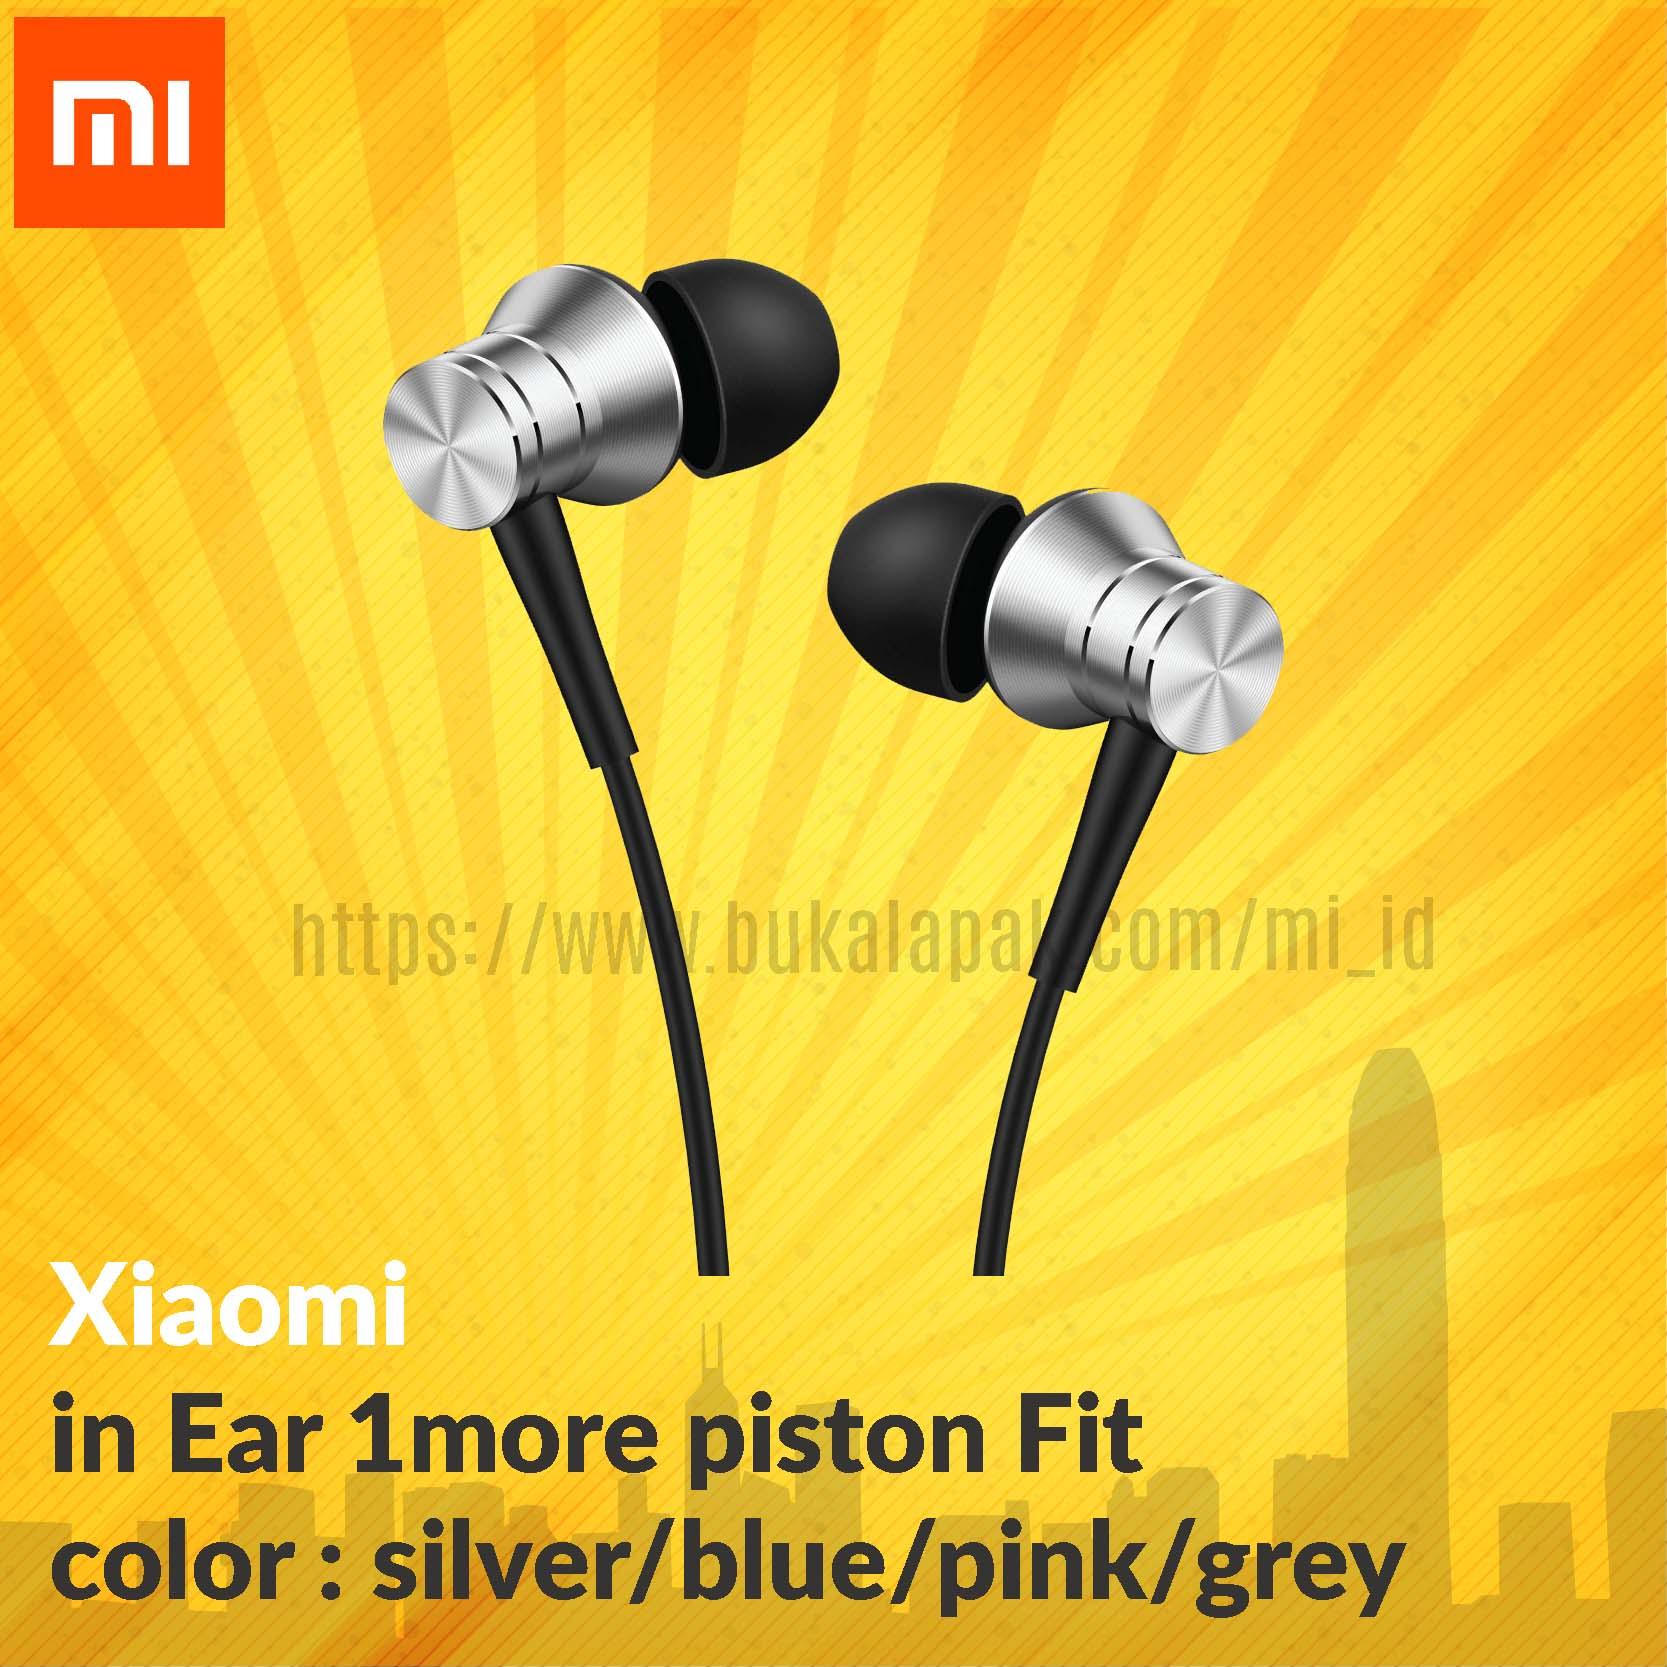 Jual Xiaomi 1more Piston Fit Mistore Tokopedia Earphone In Ear